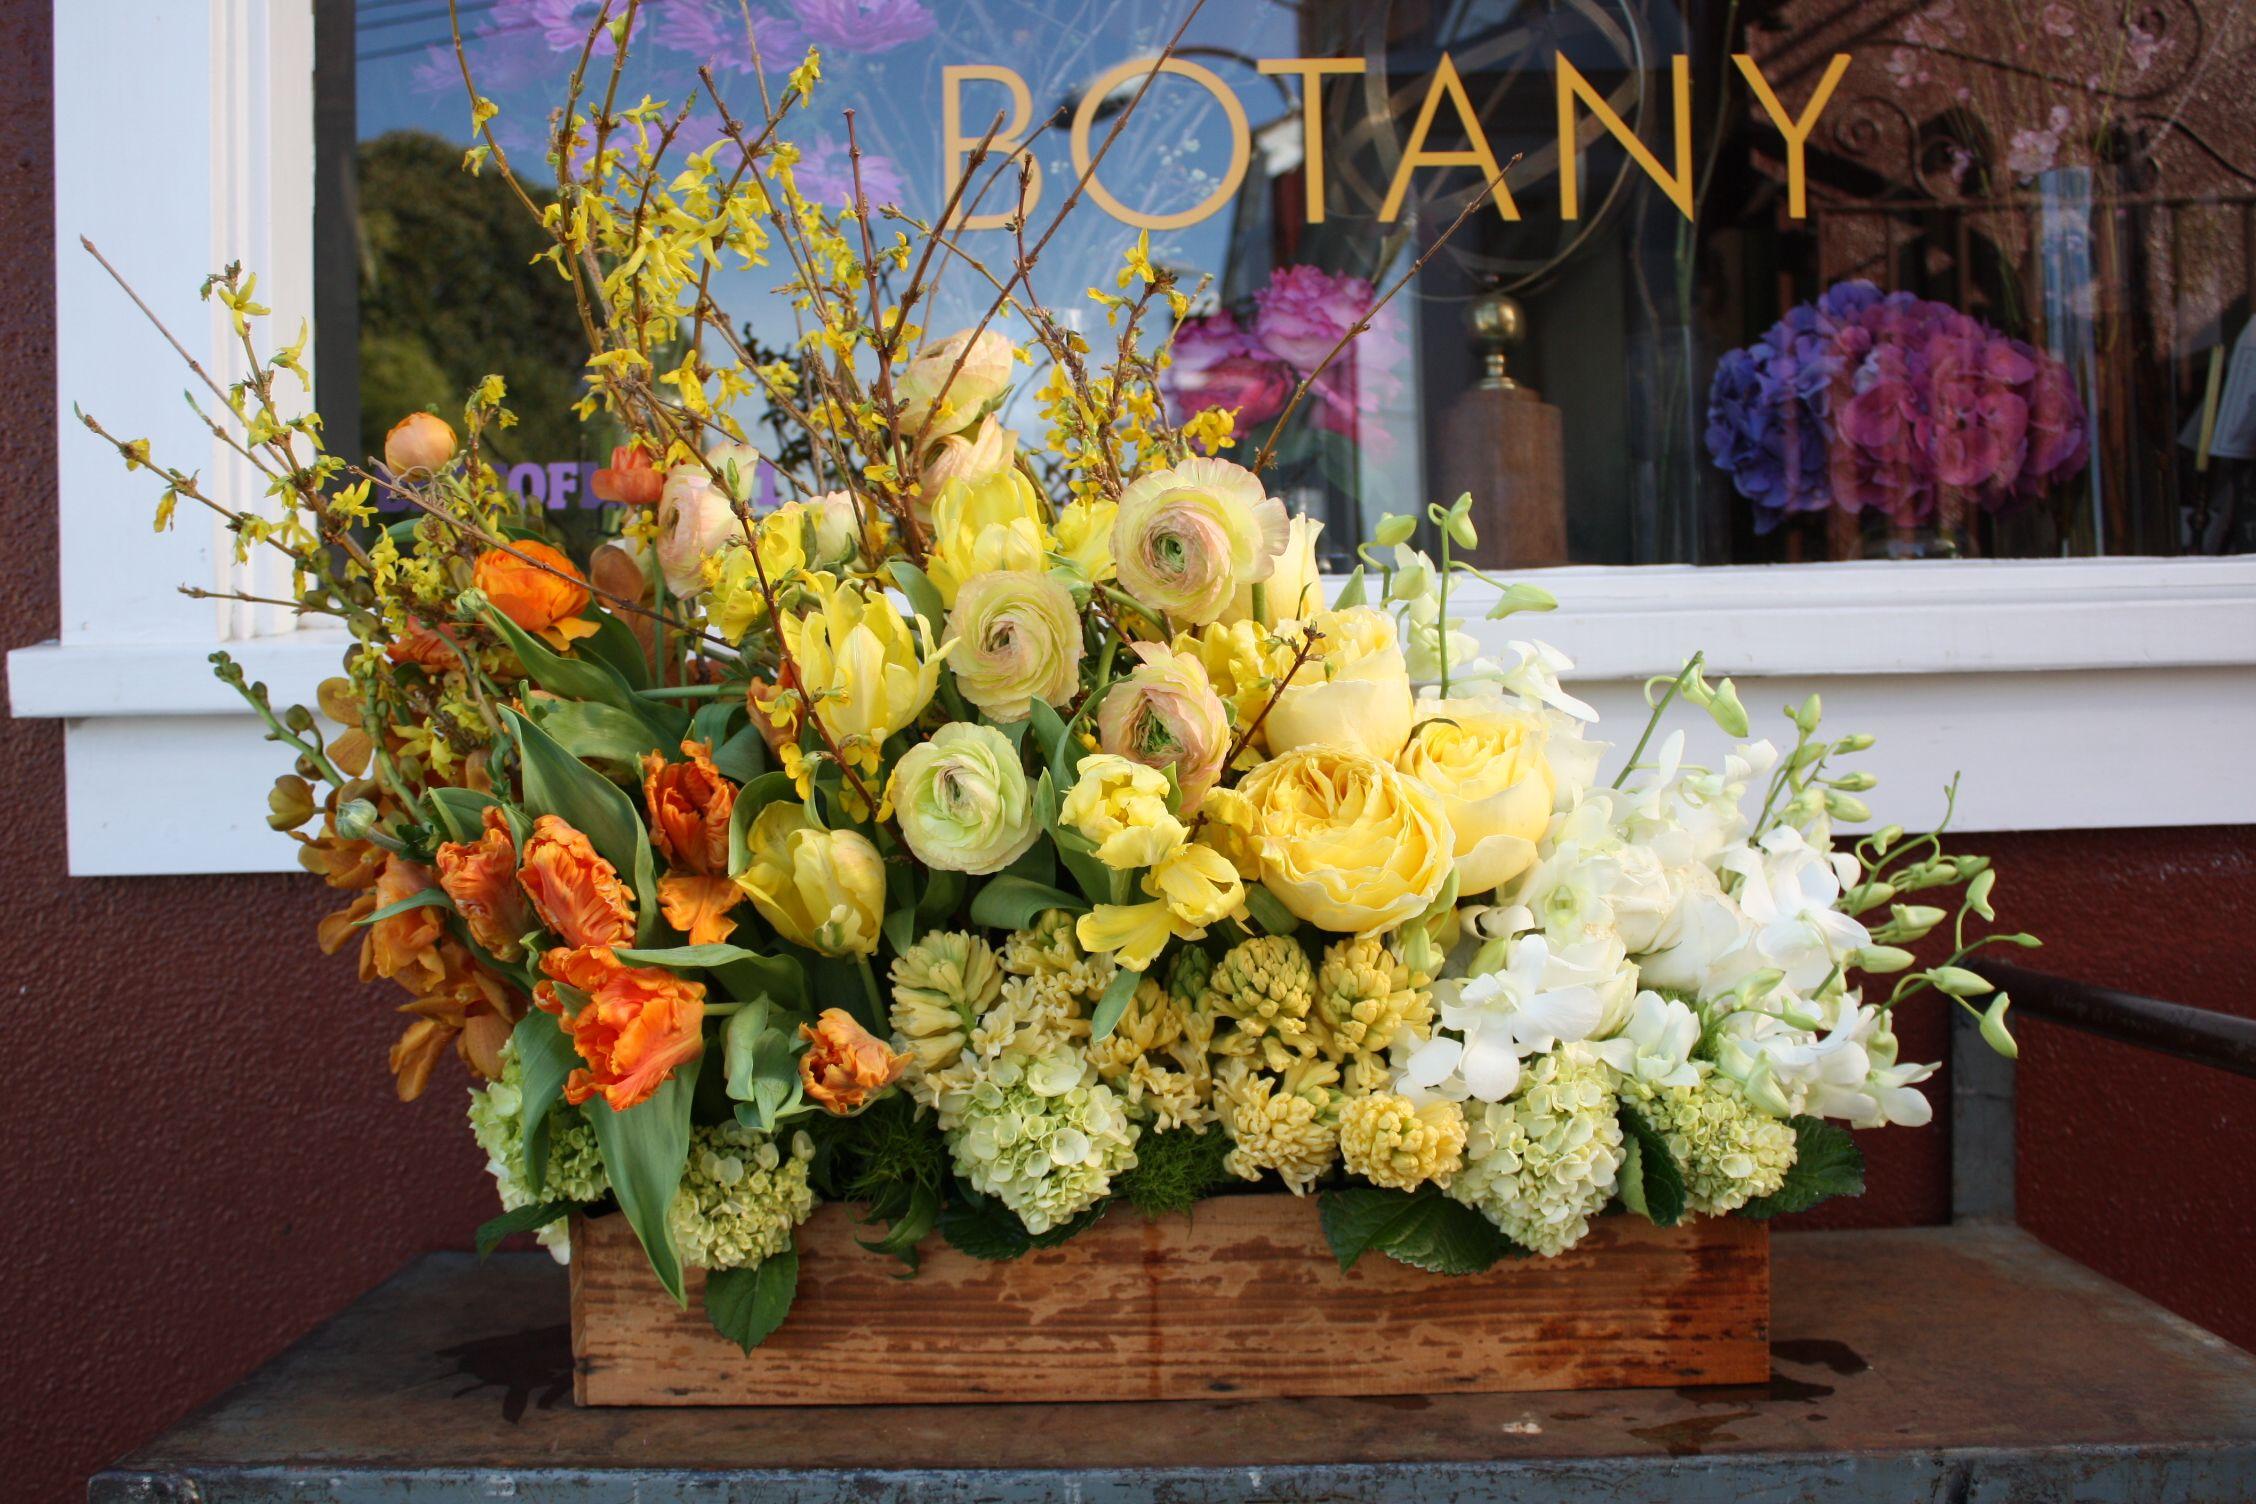 forsythia, parrot tulips, hyacinth, ranunculus